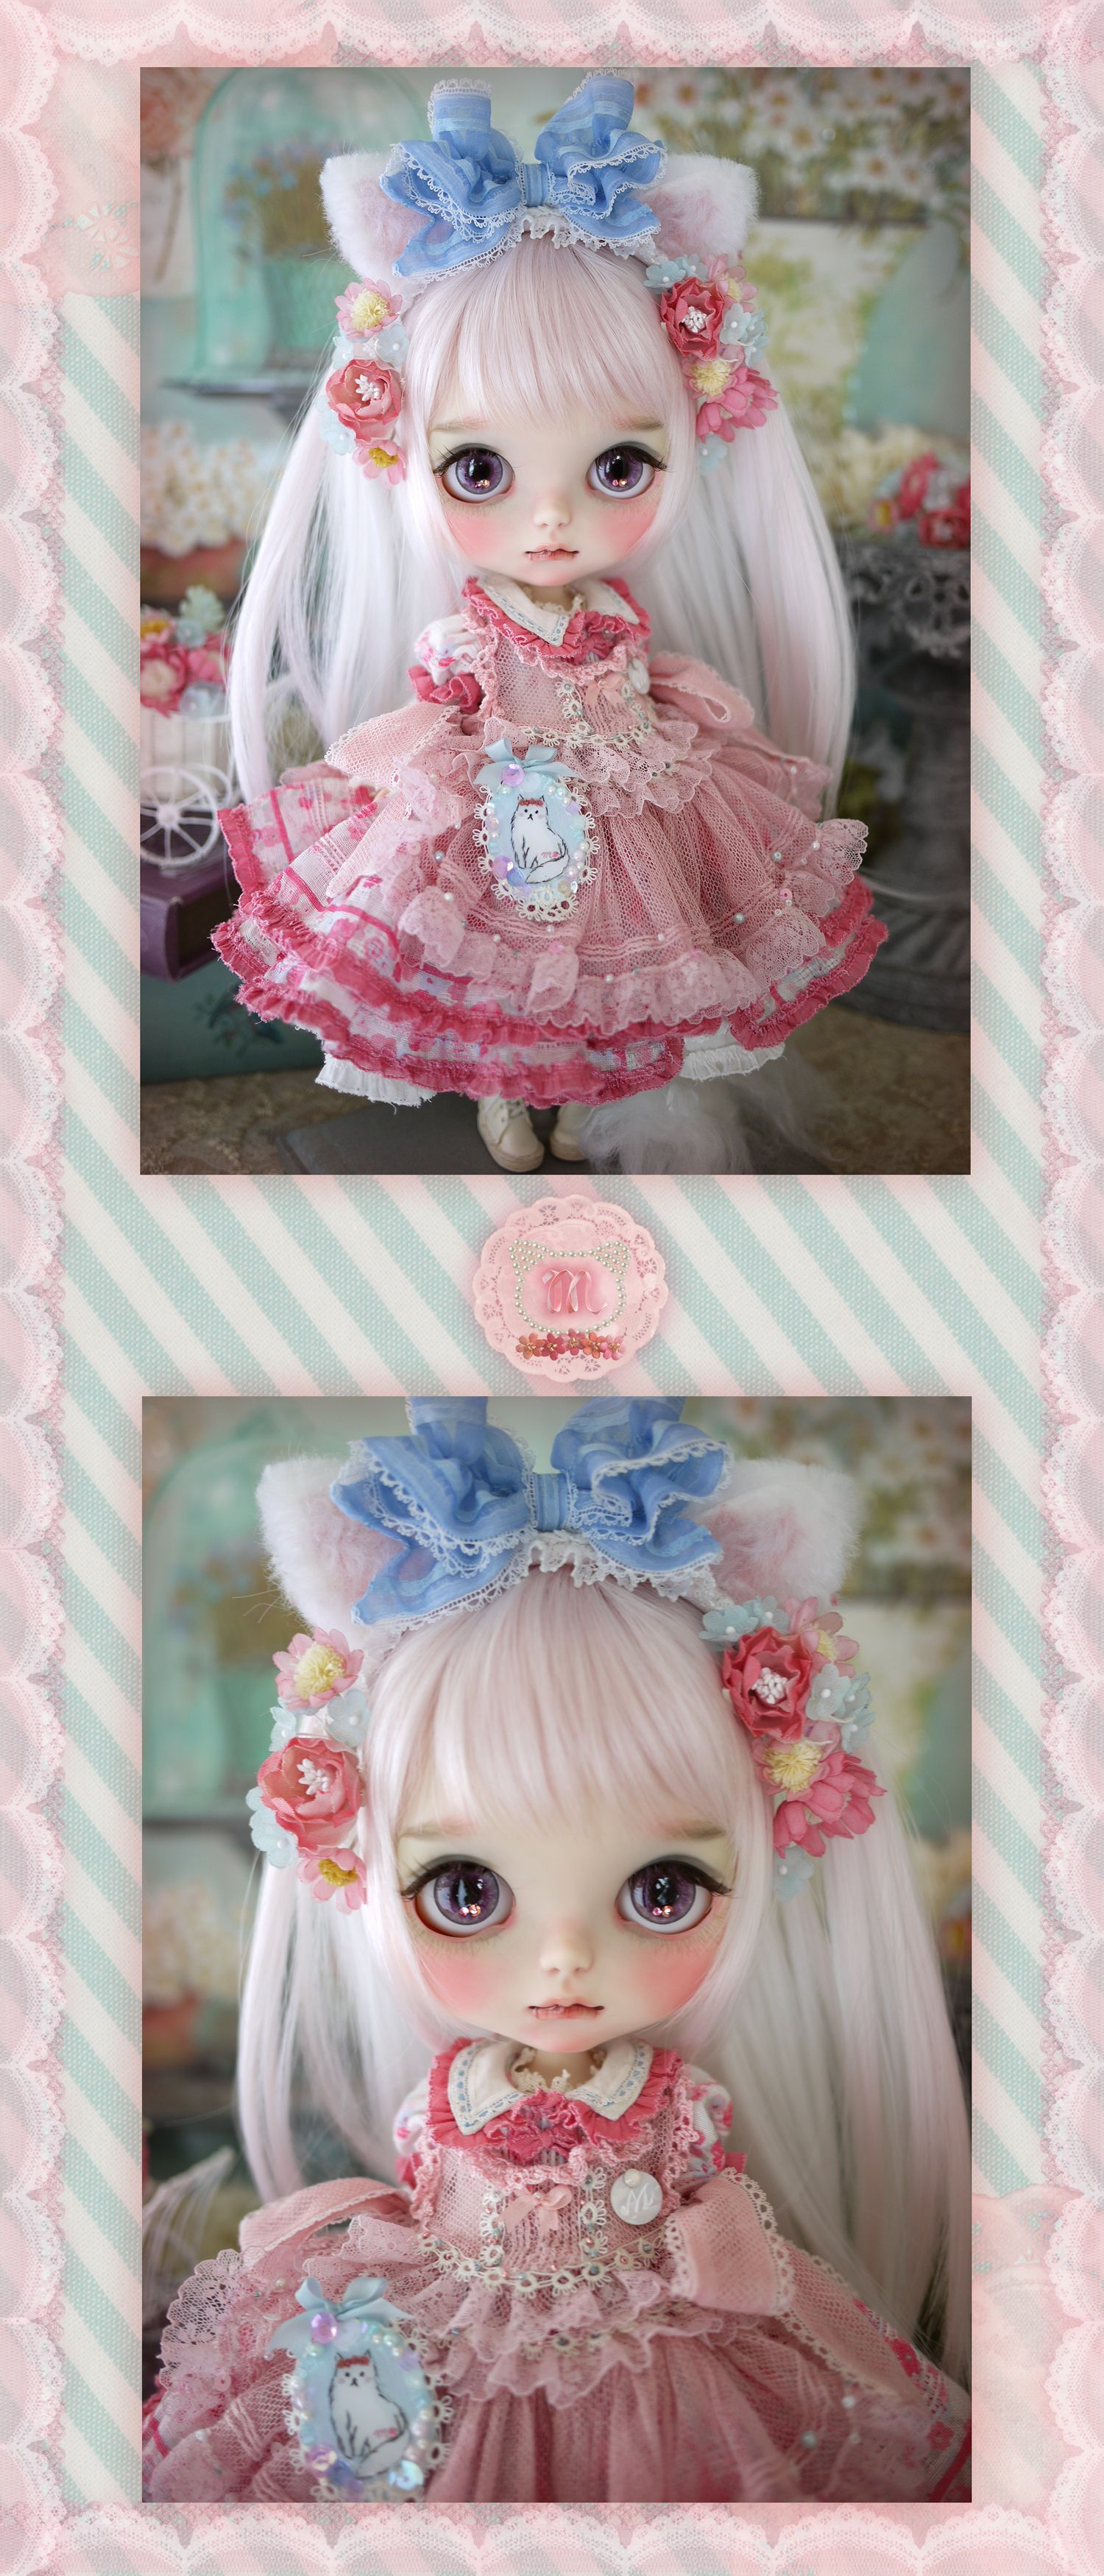 Auction Yahoo Japan Auctions Ebay Japan アートドール かわいい人形 可愛い 人形